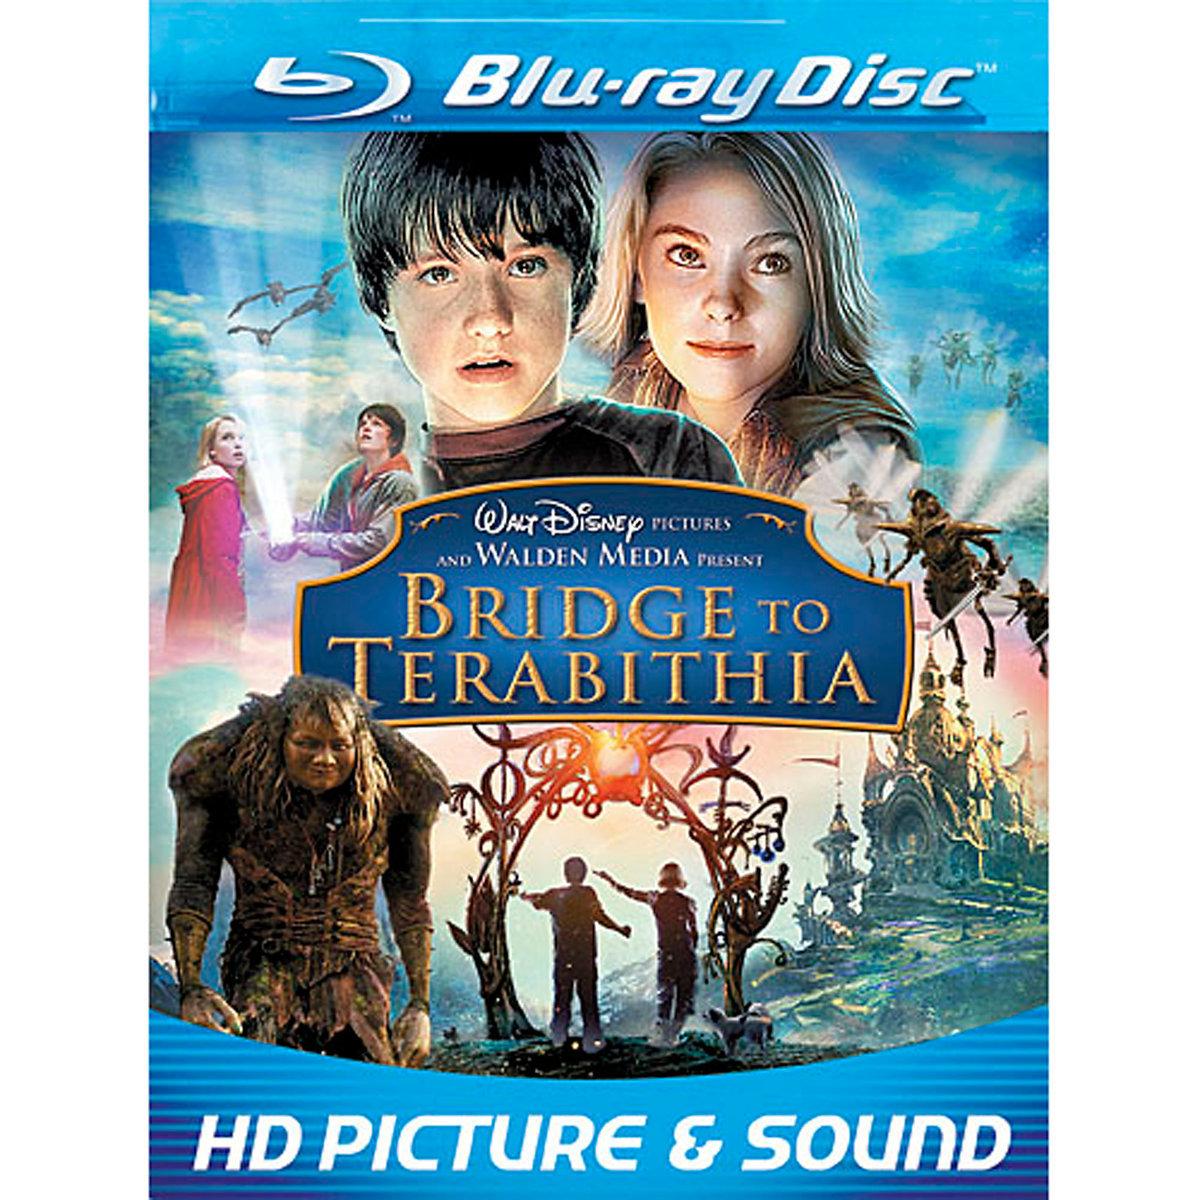 Bridge To Terabithia (Blu-ray)